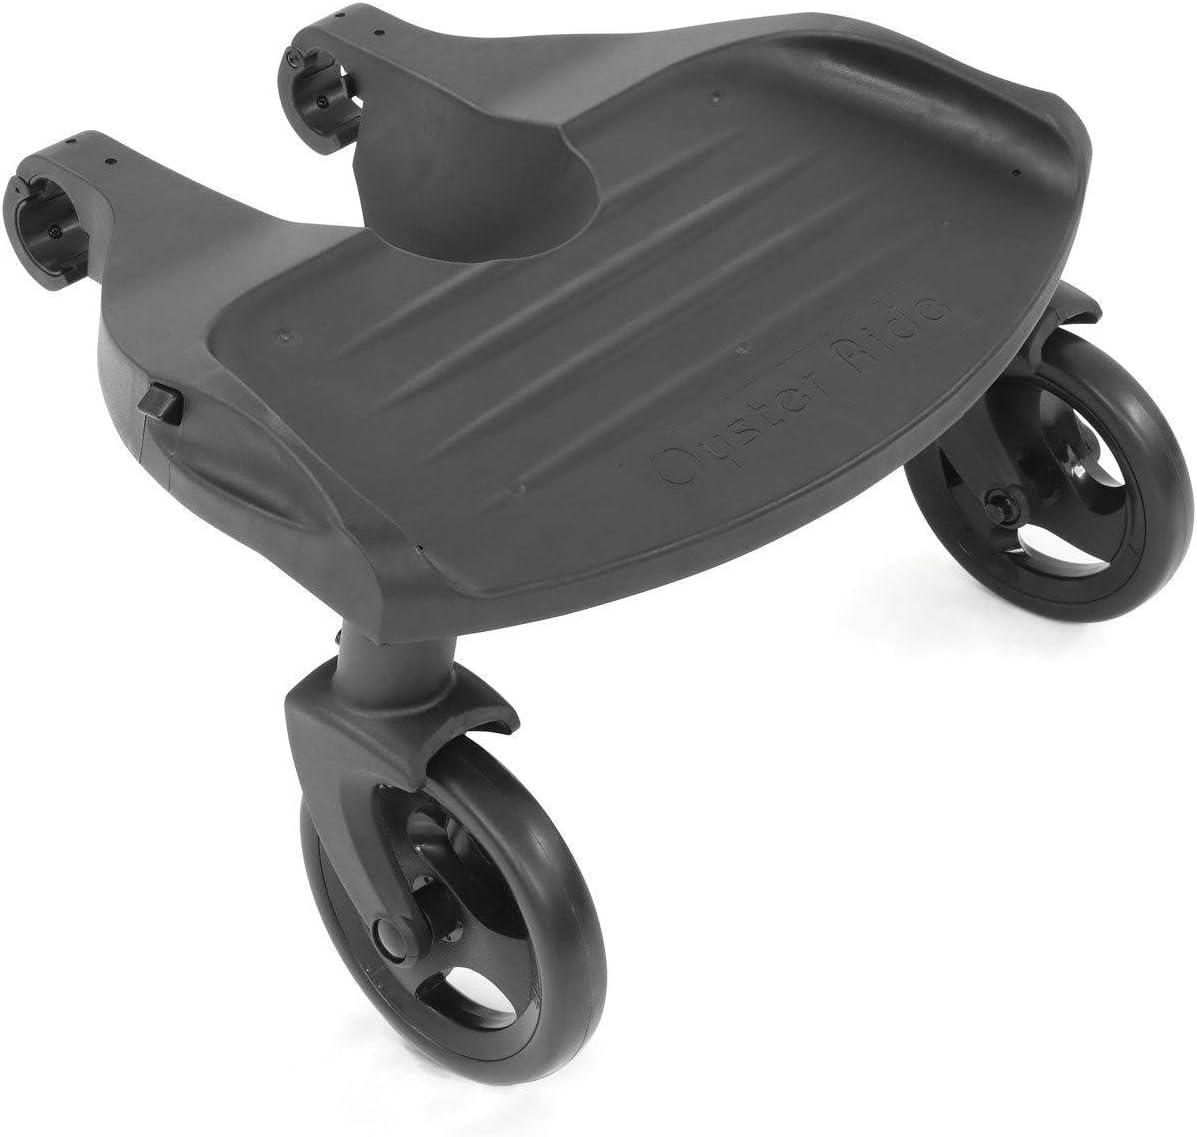 Ride on Board avec selle compatible avec BABYSTYLE OYSTER 3-Noir